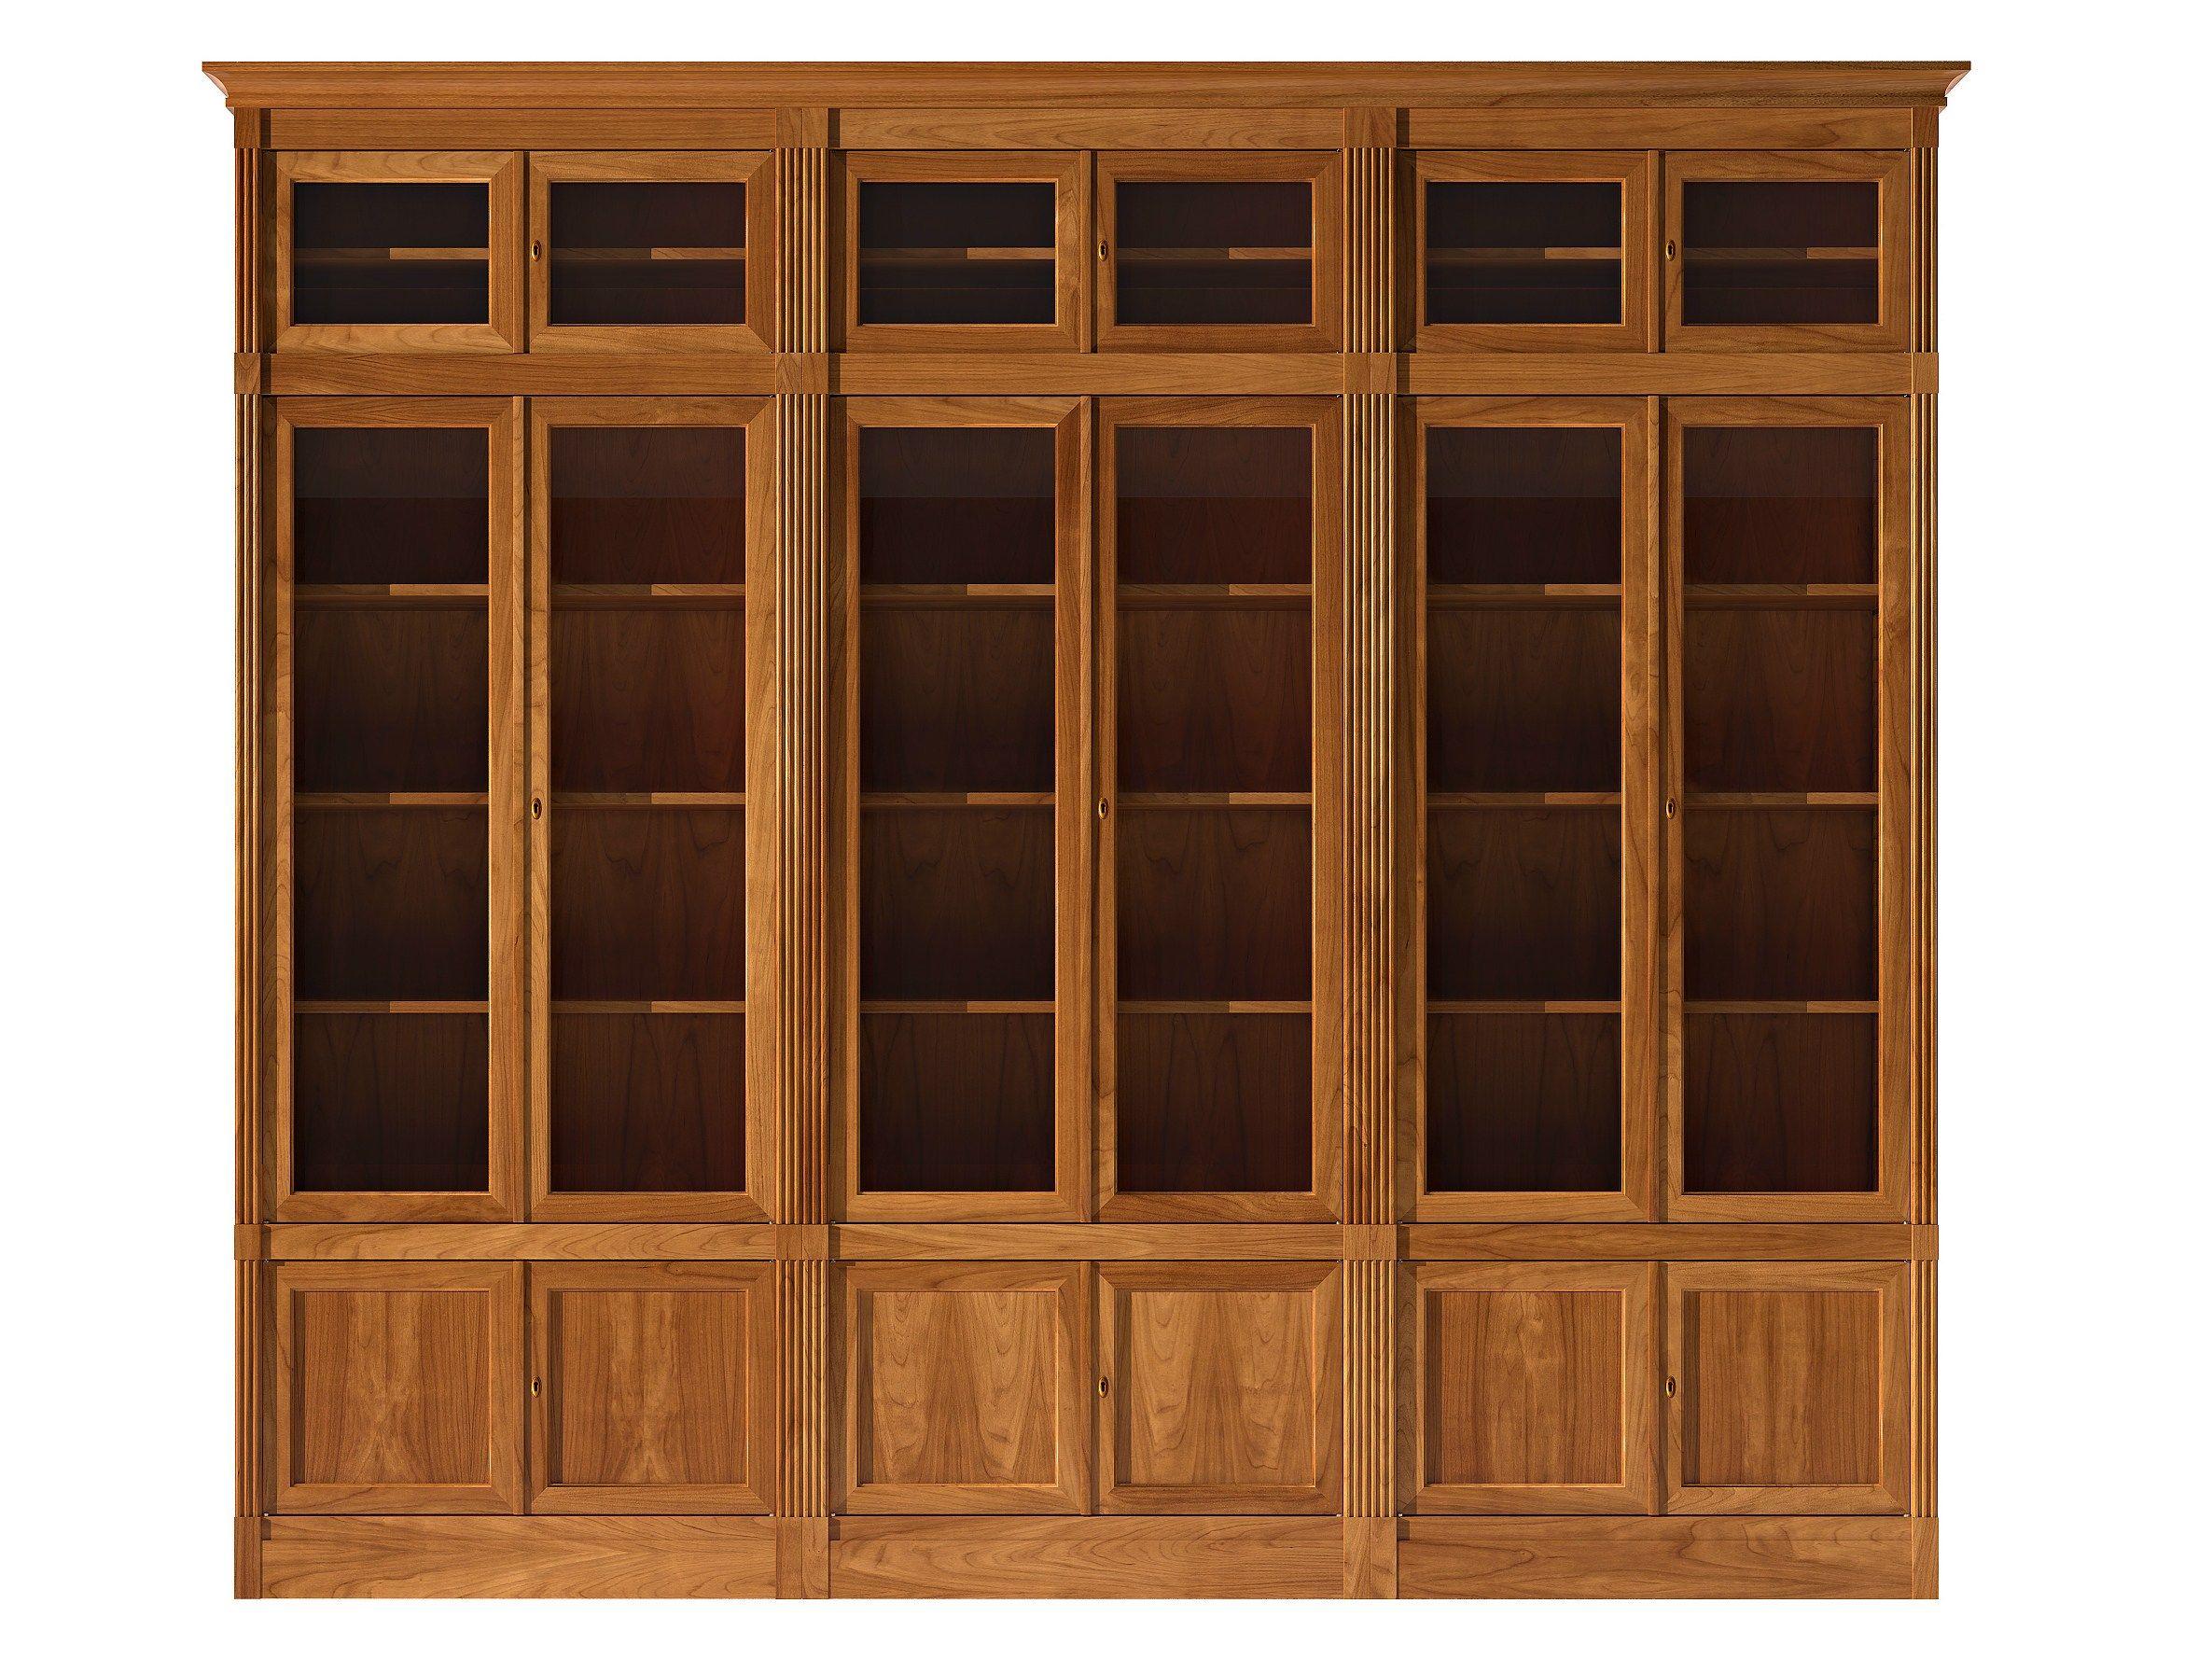 Библиотека direttorio fs3010186 (morelato) - цена со скидкой.